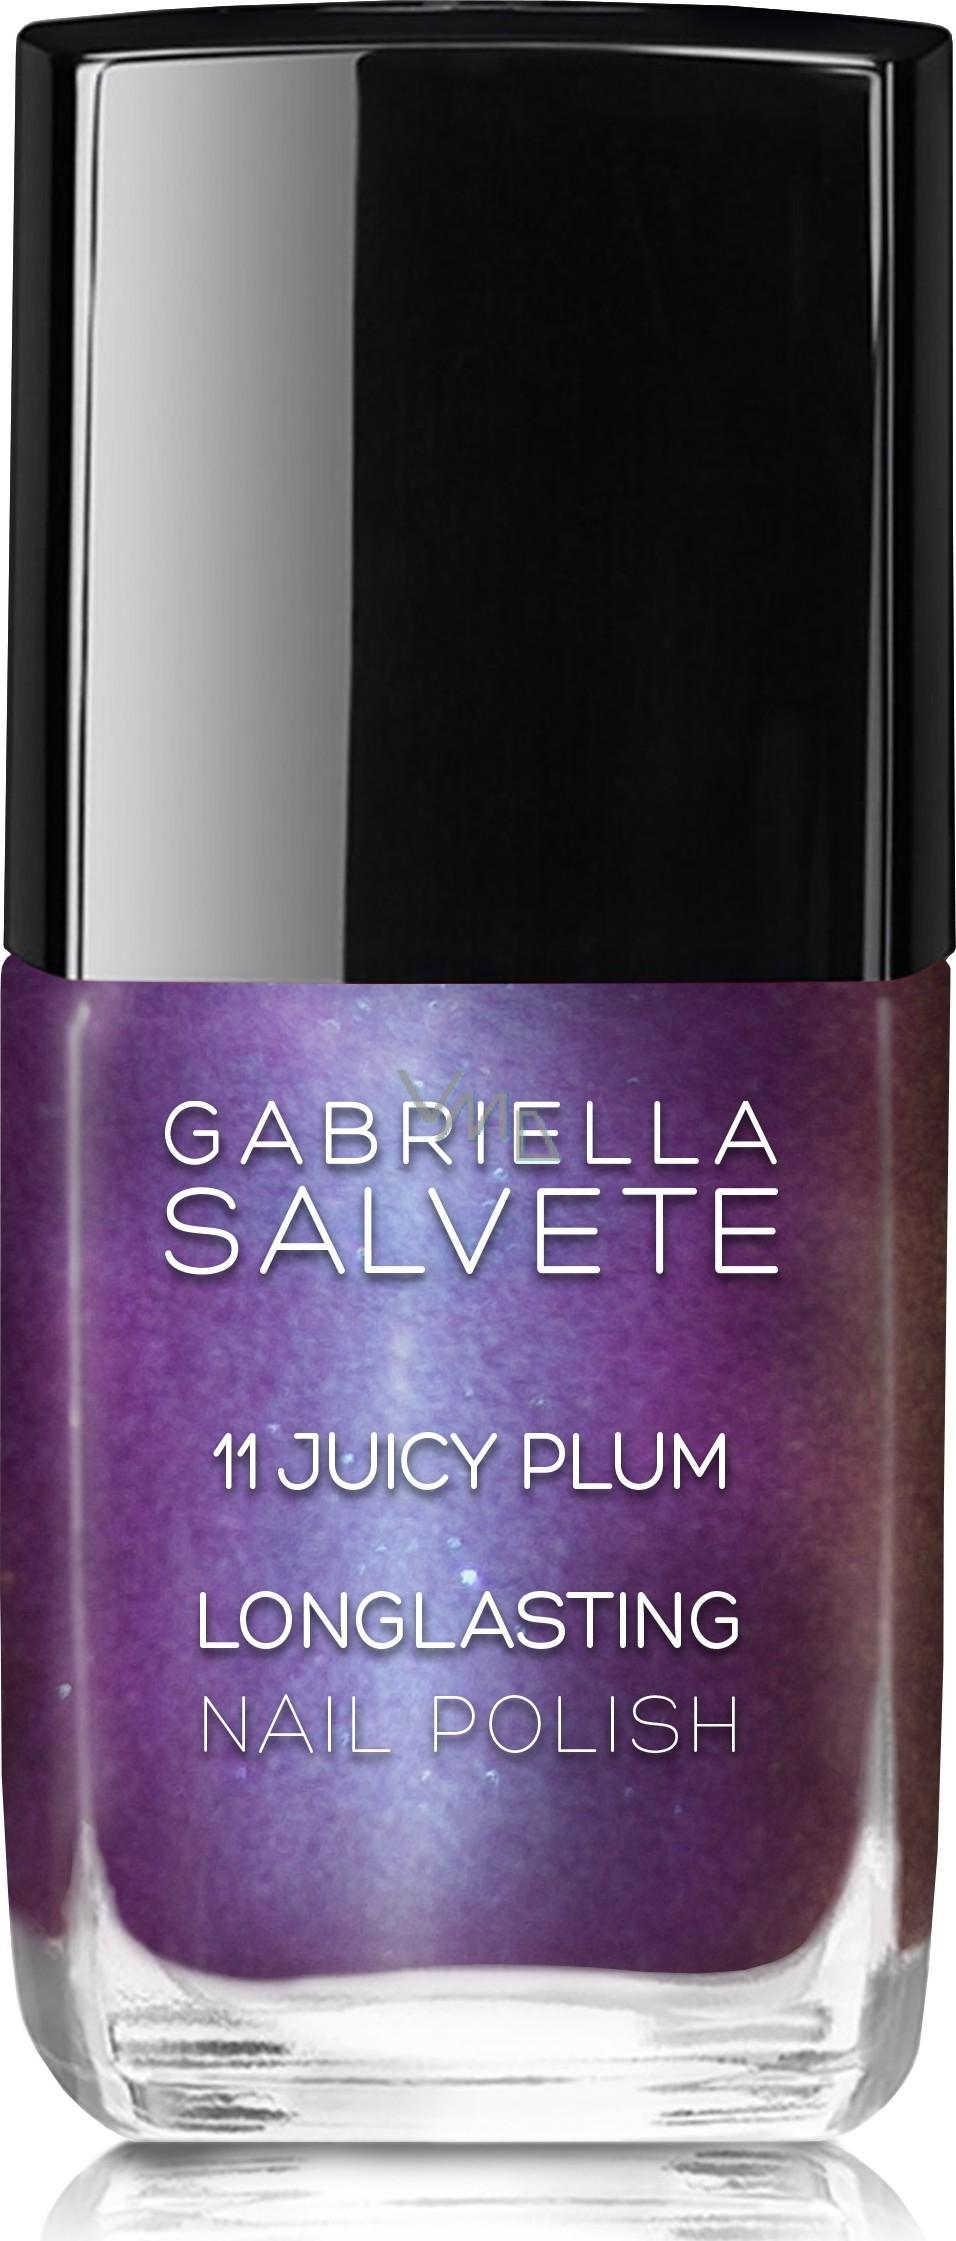 Gabriella Salvete Longlasting Enamel Long Lasting High Gloss Nail Polish 11 Juicy Plum 11 Ml Vmd Parfumerie Drogerie